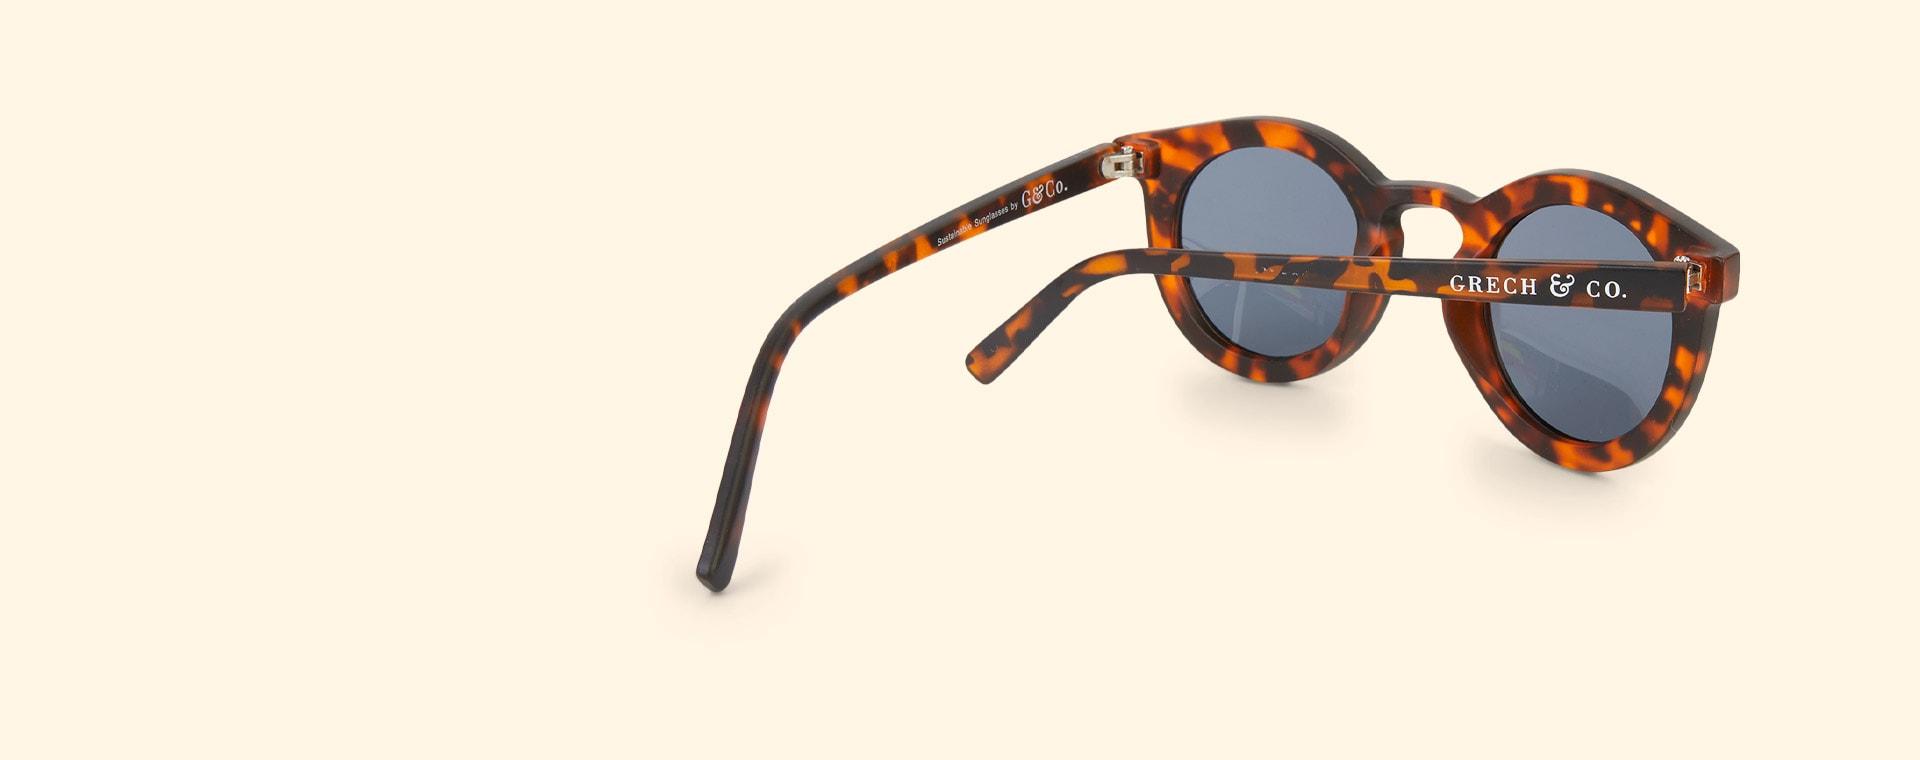 Tortoise Grech & Co New Sustainable Sunglasses